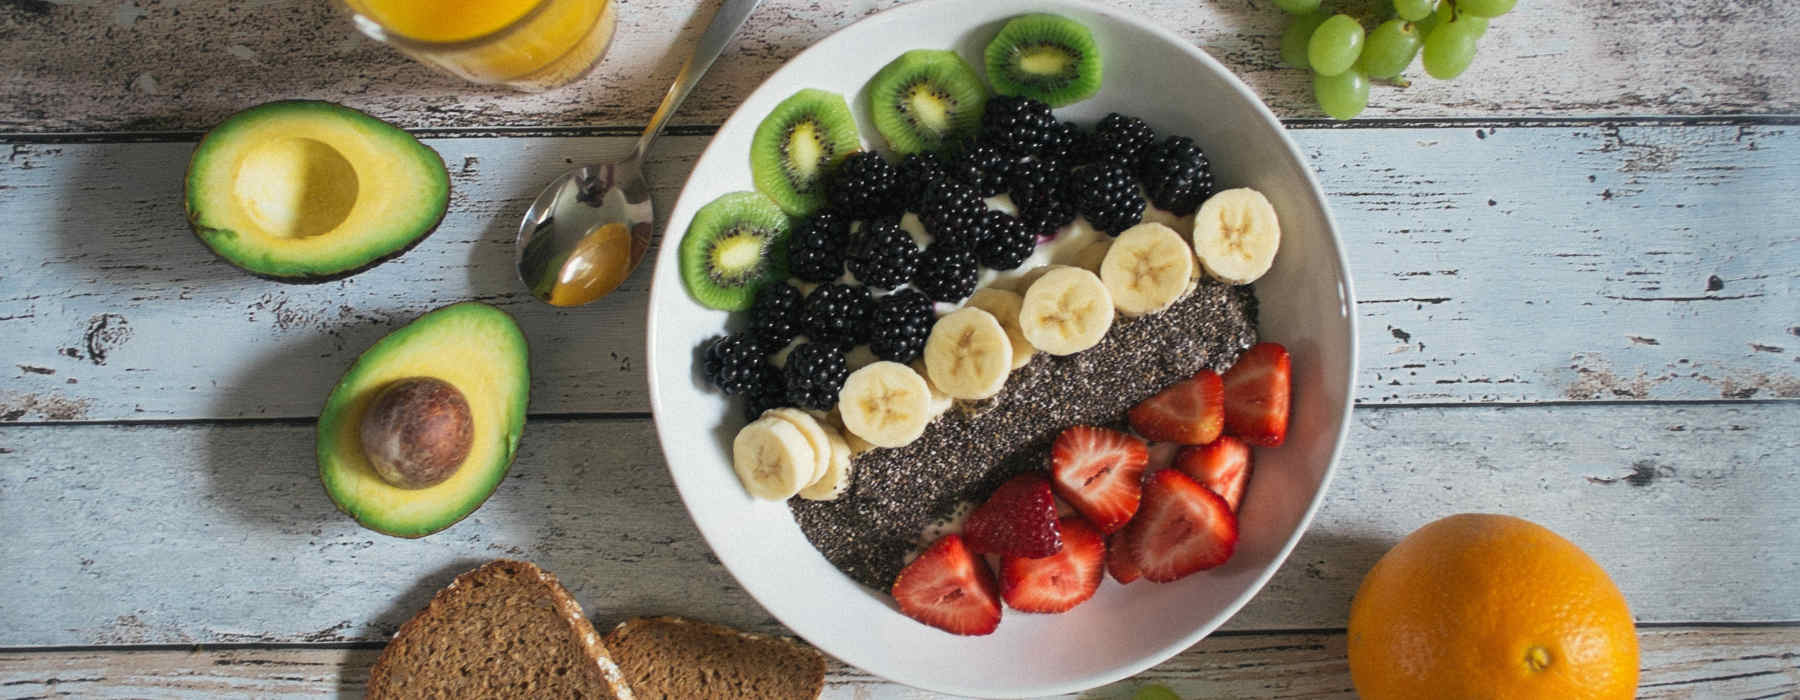 petit dejeune vegan